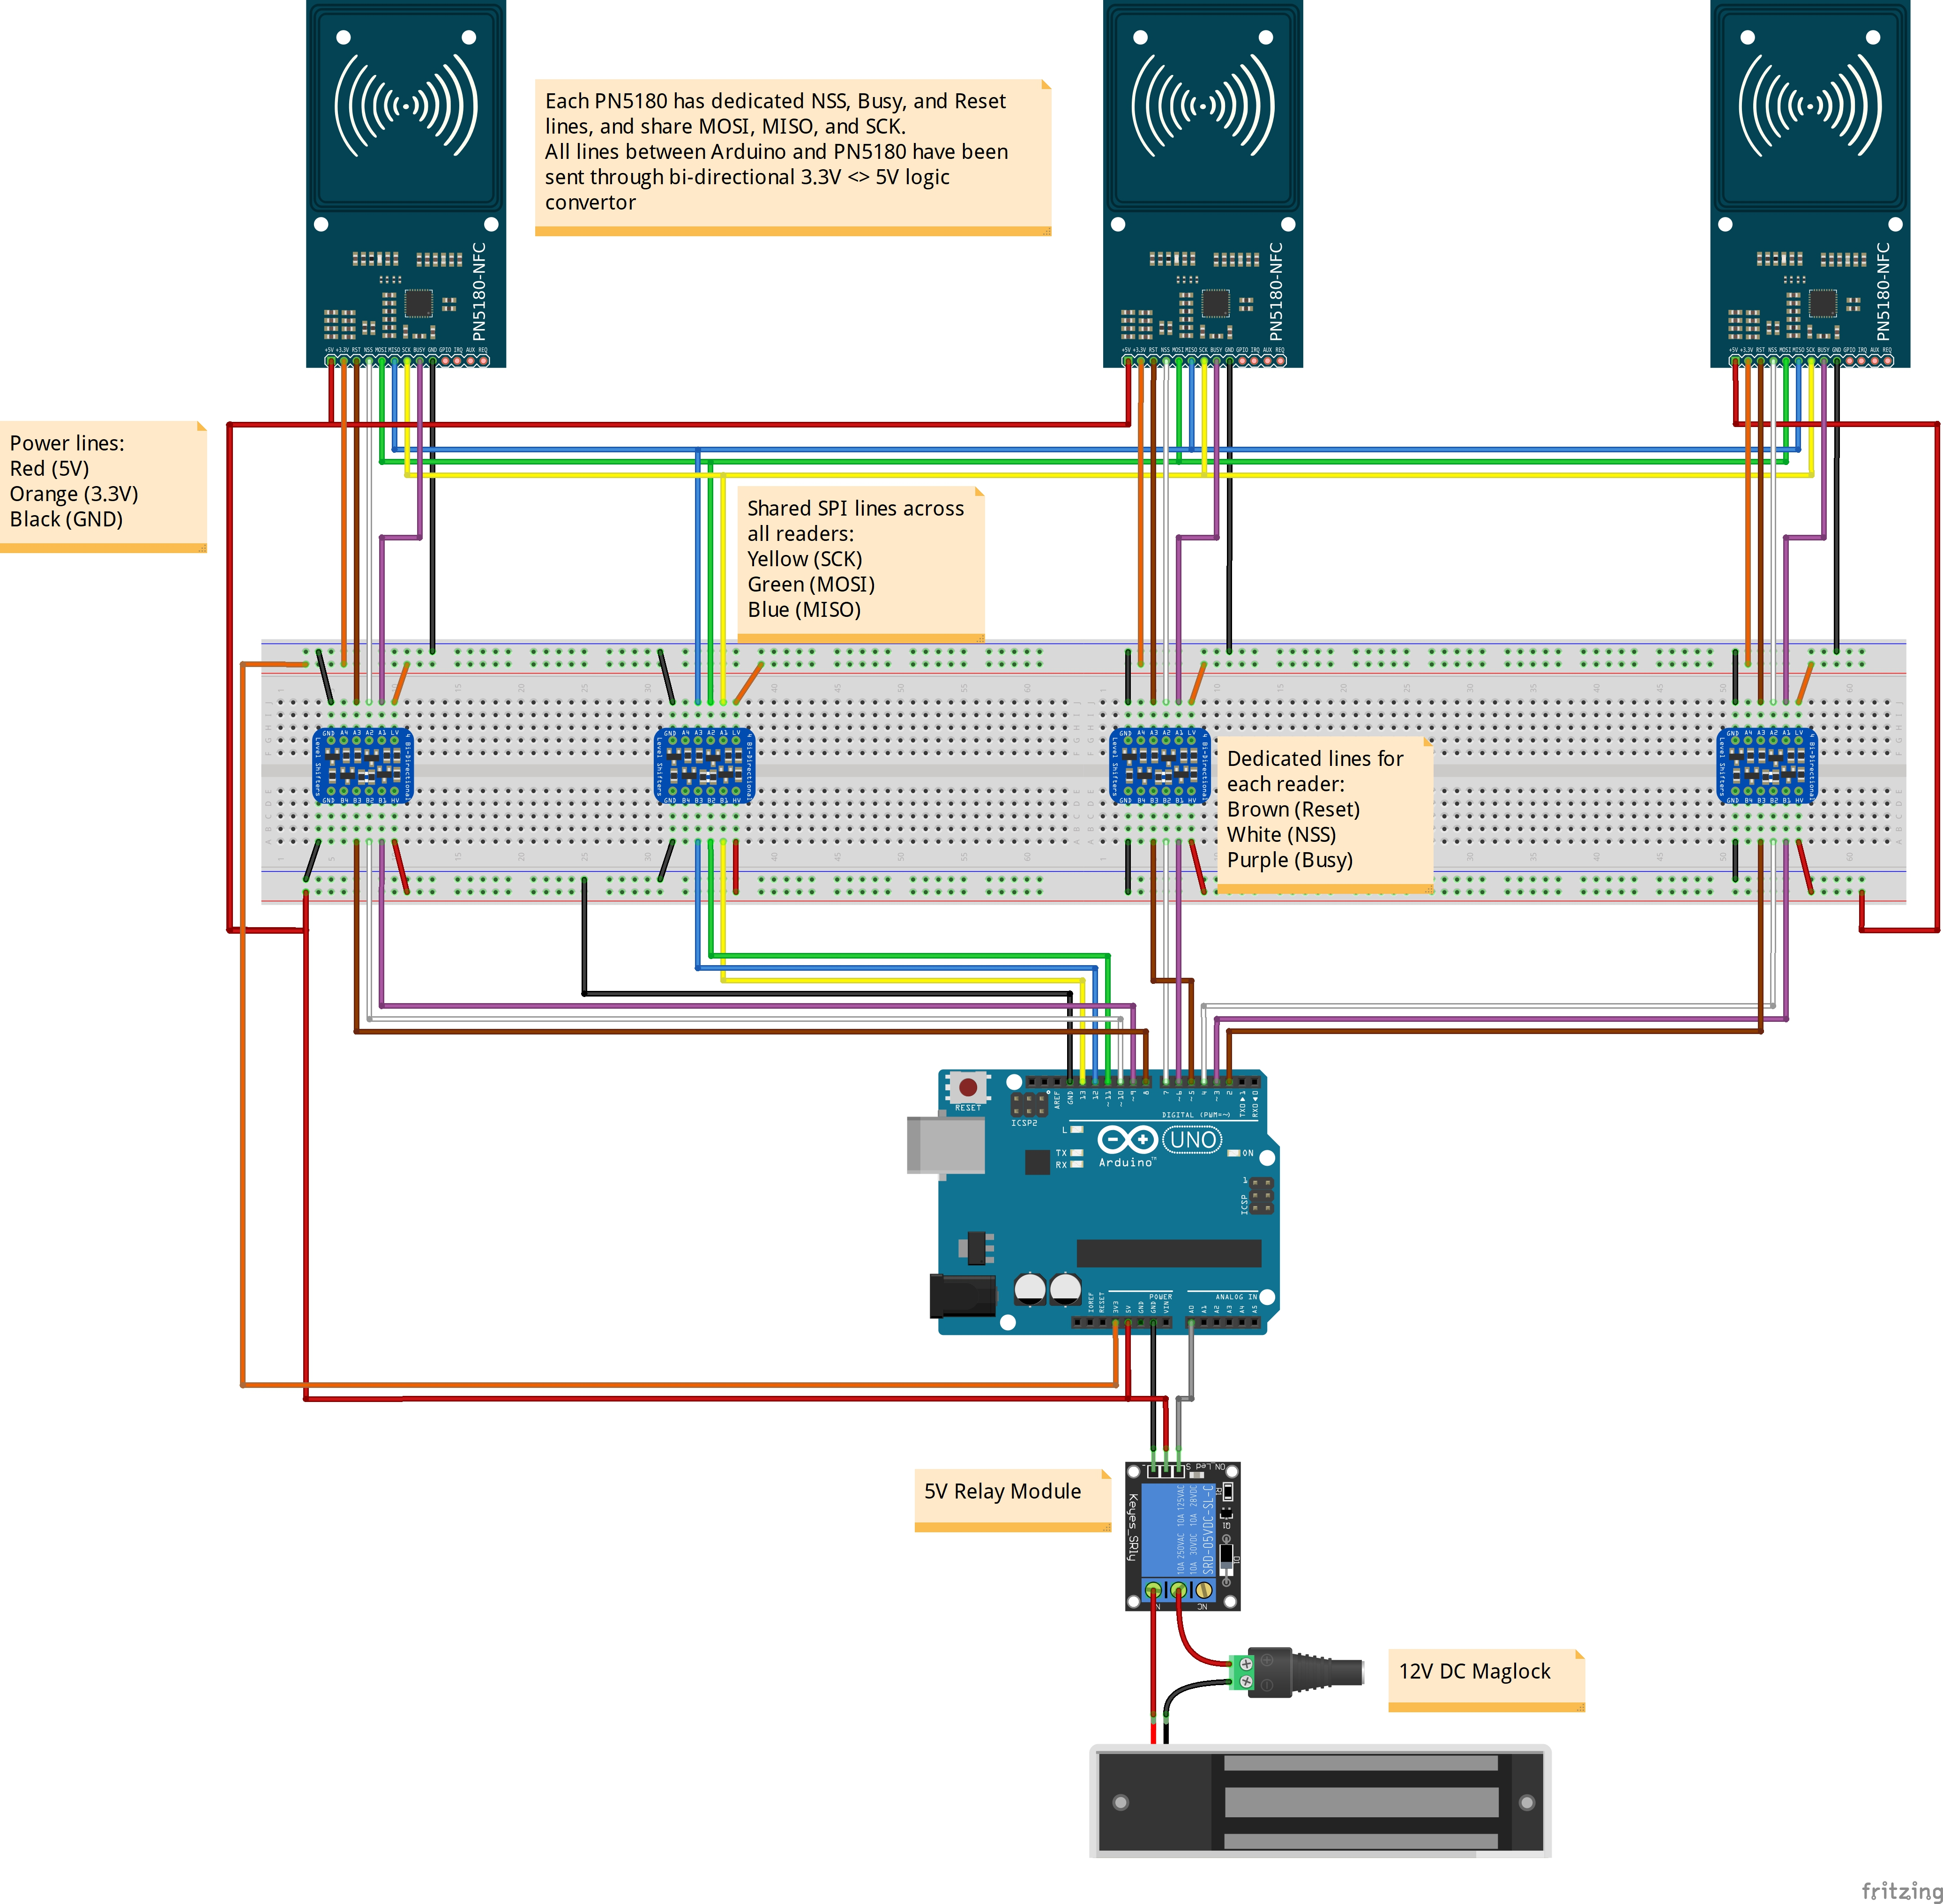 GitHub - playfultechnology/arduino-rfid-PN5180: Interfacing ... on parallax rfid, mobile rfid, connected car rfid, nfc vs rfid, diy rfid,